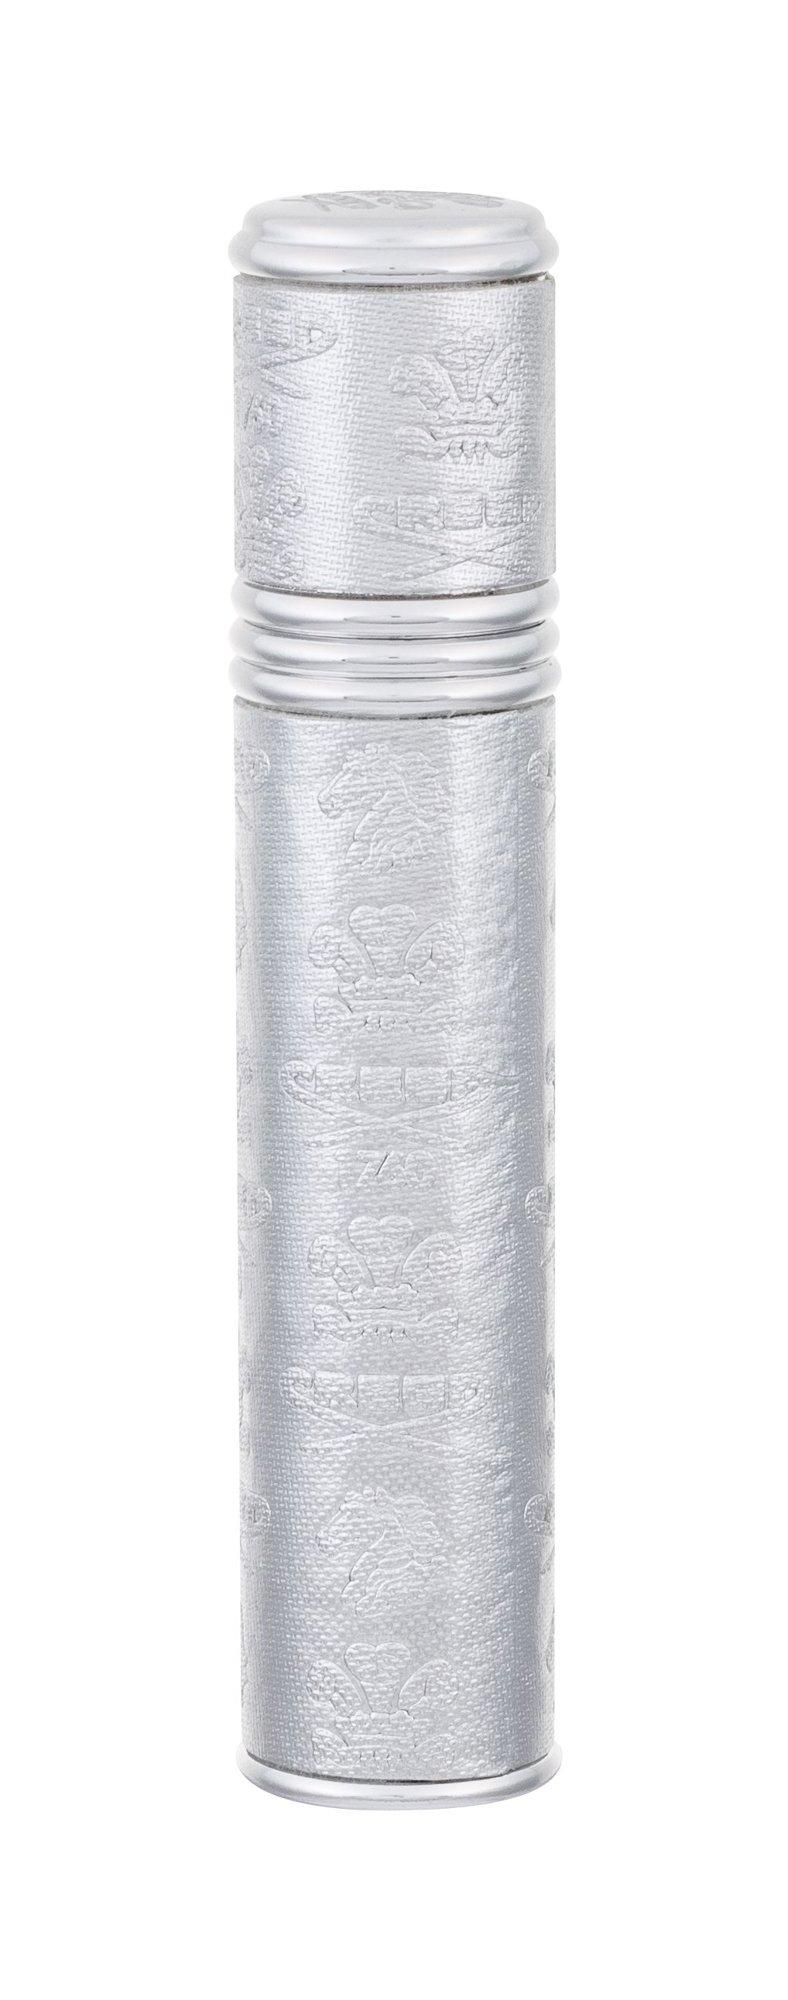 Creed Atomiser Refillable 10ml Silver/Silver